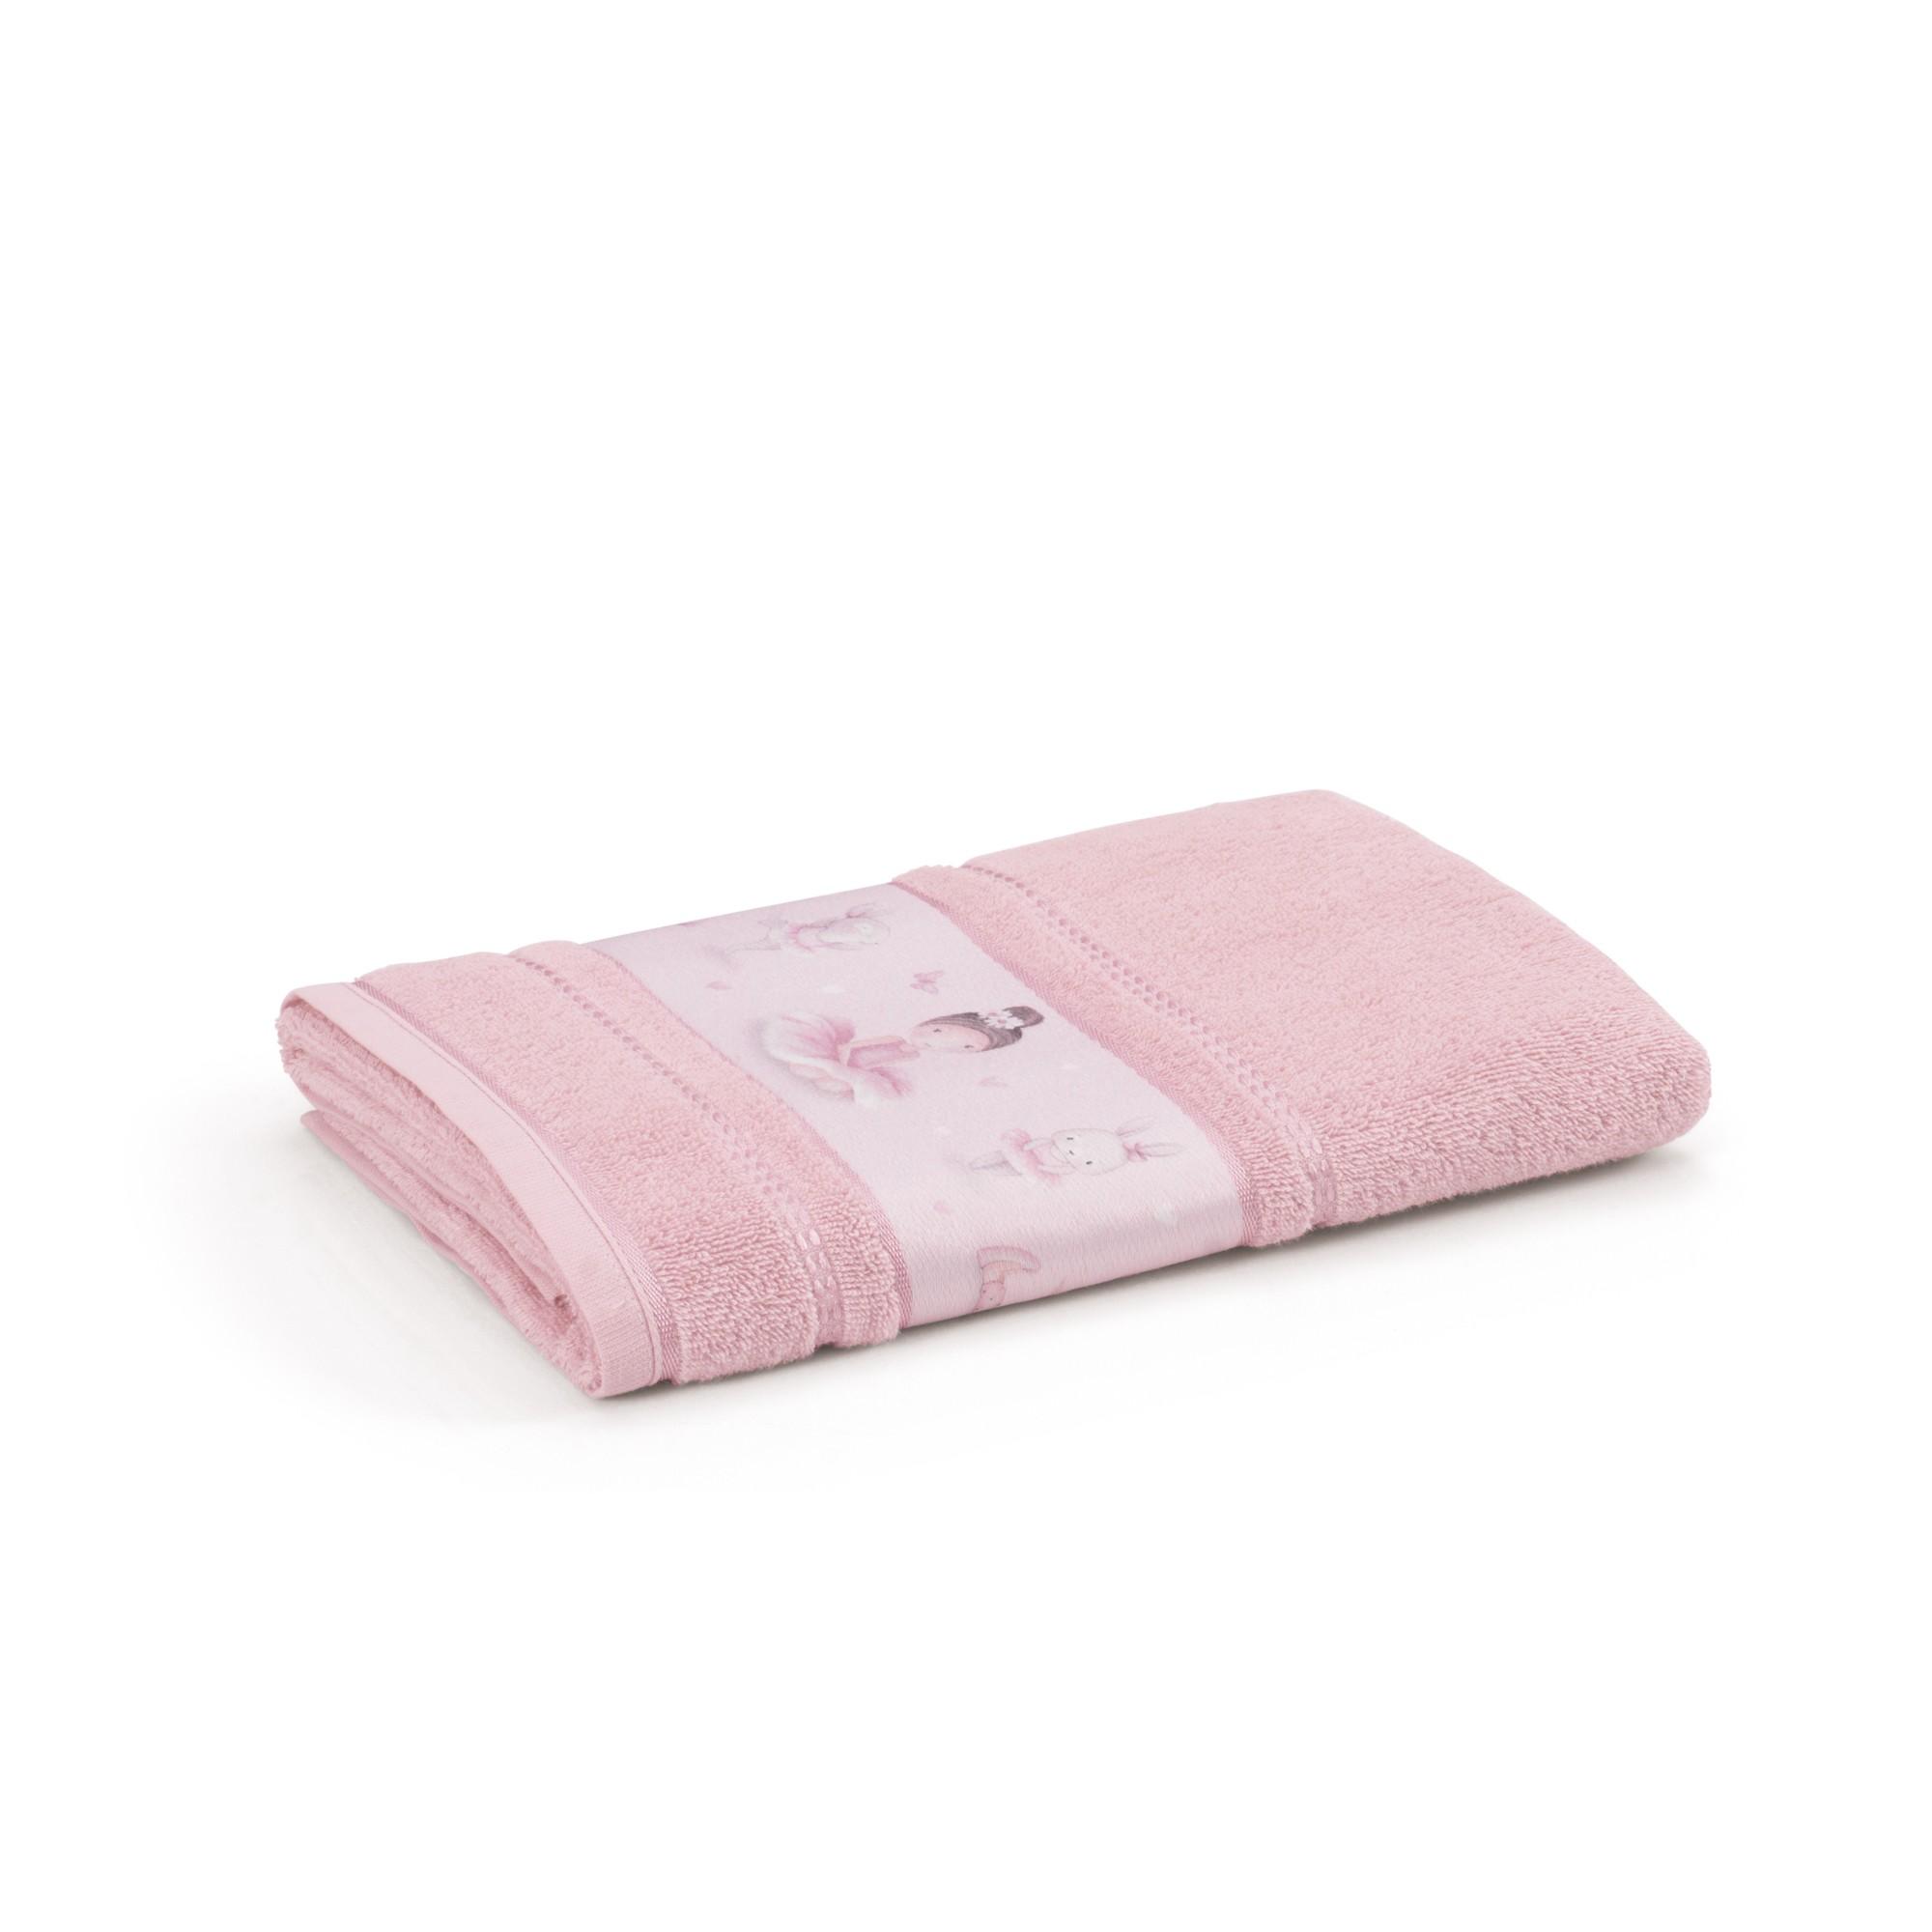 Toalha de Banho Infantil Bailarina 67 x 135 cm Rosa - Karsten